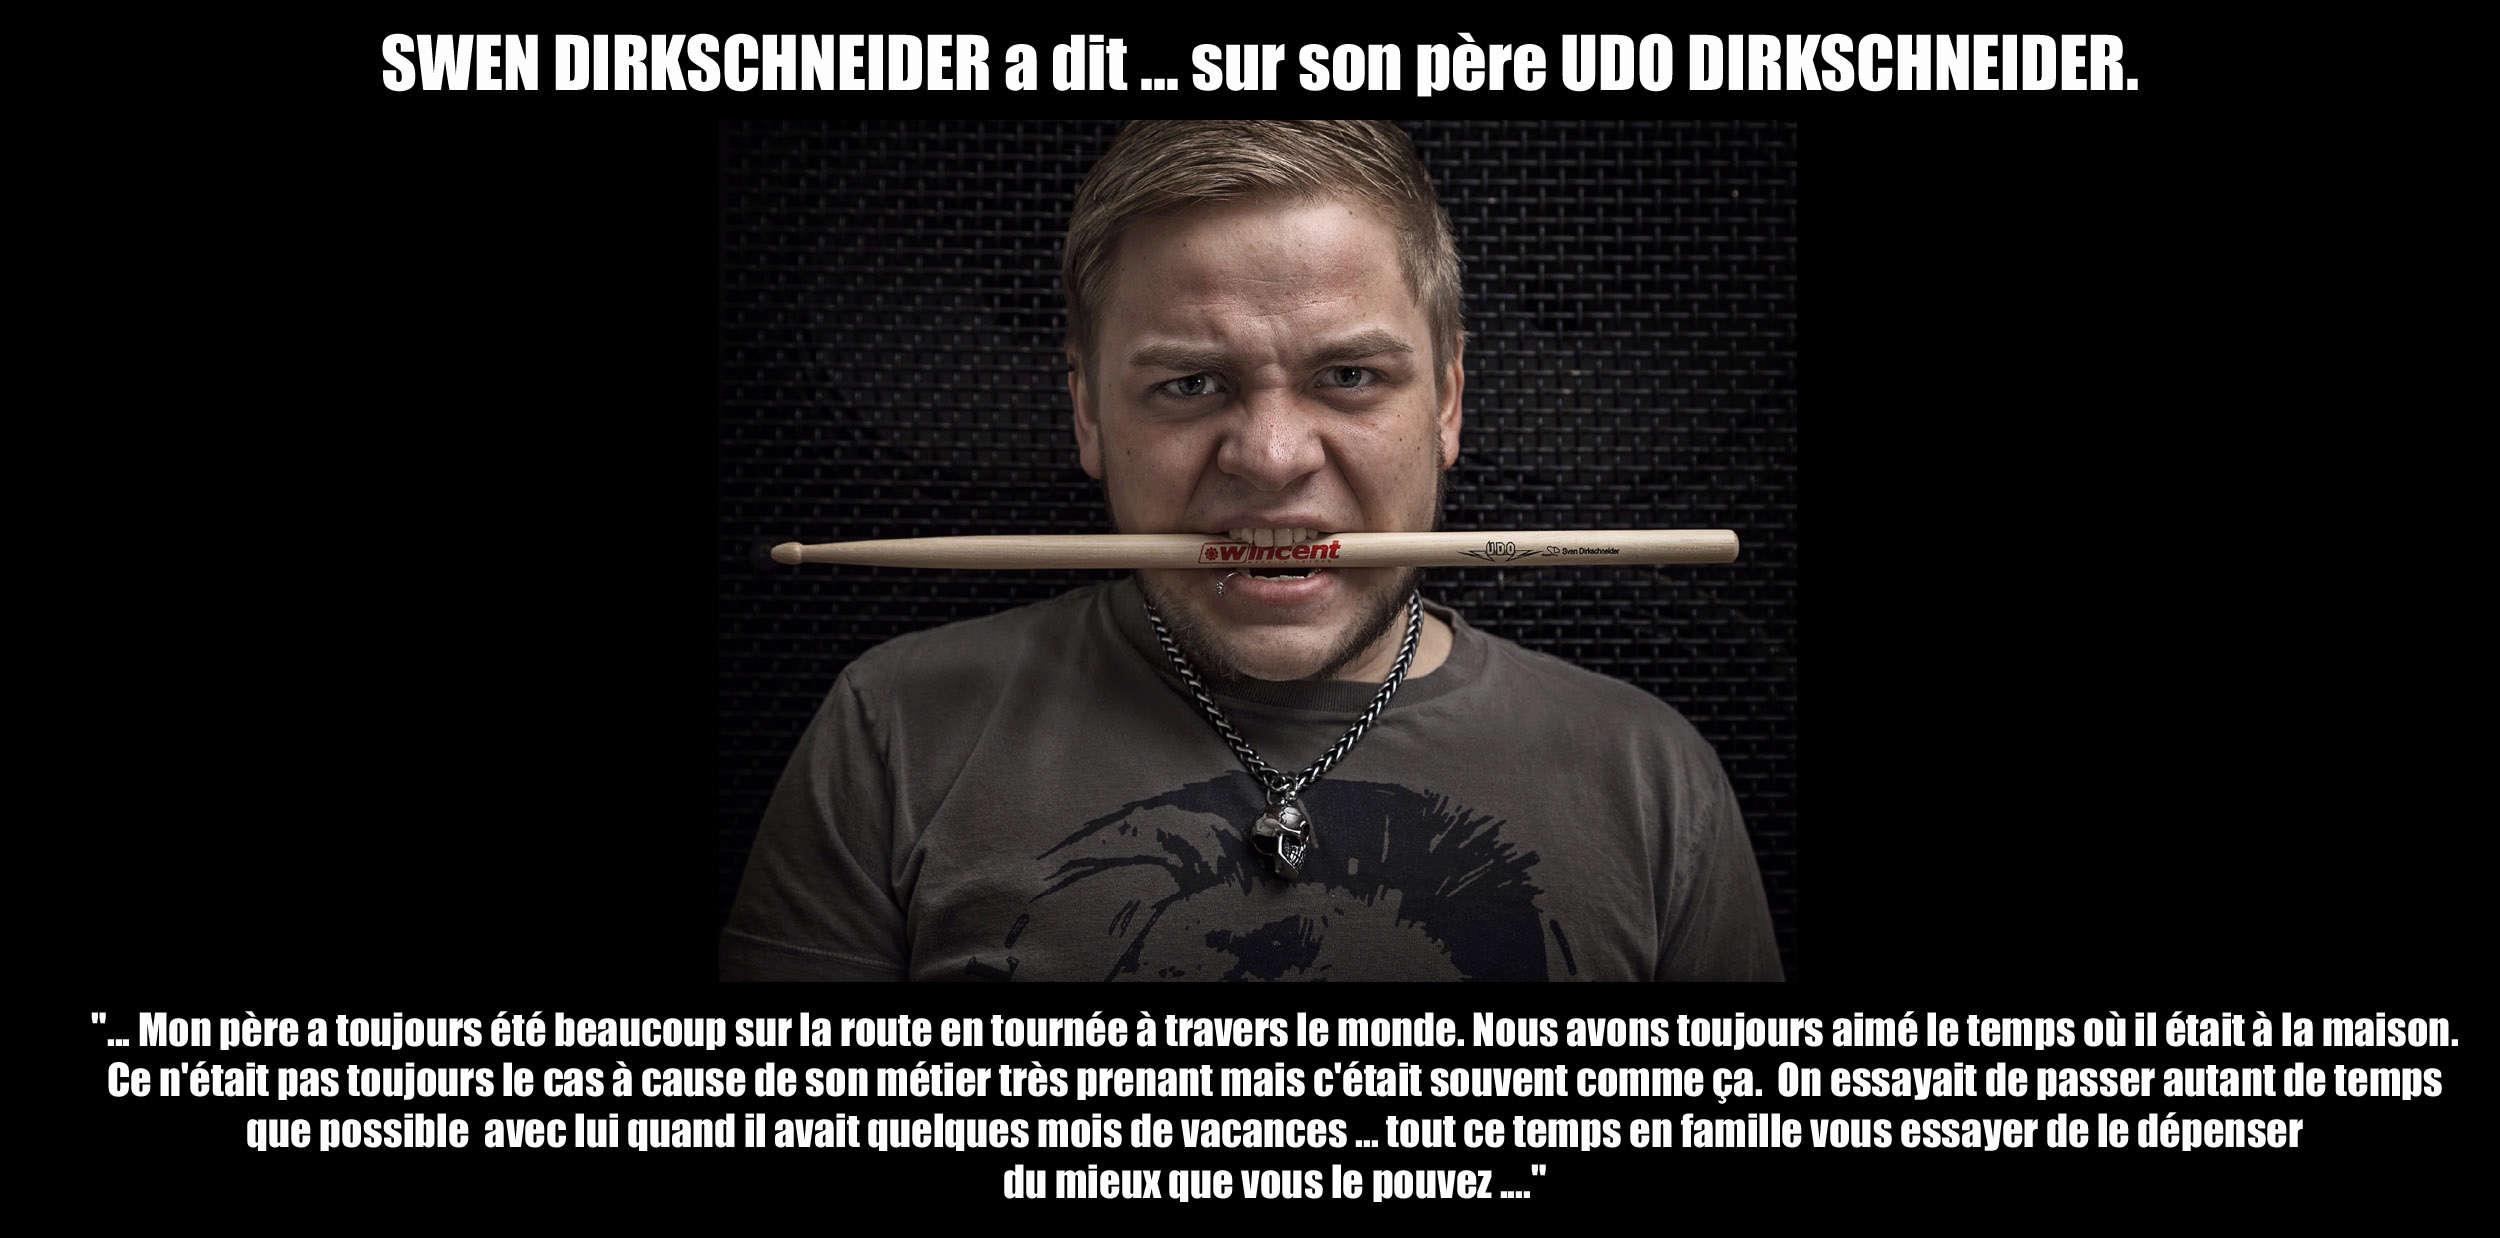 SWEN DIRKSCHNEIDER a dit ... sur son père UDO DIRKSCHNEIDER. Udo10